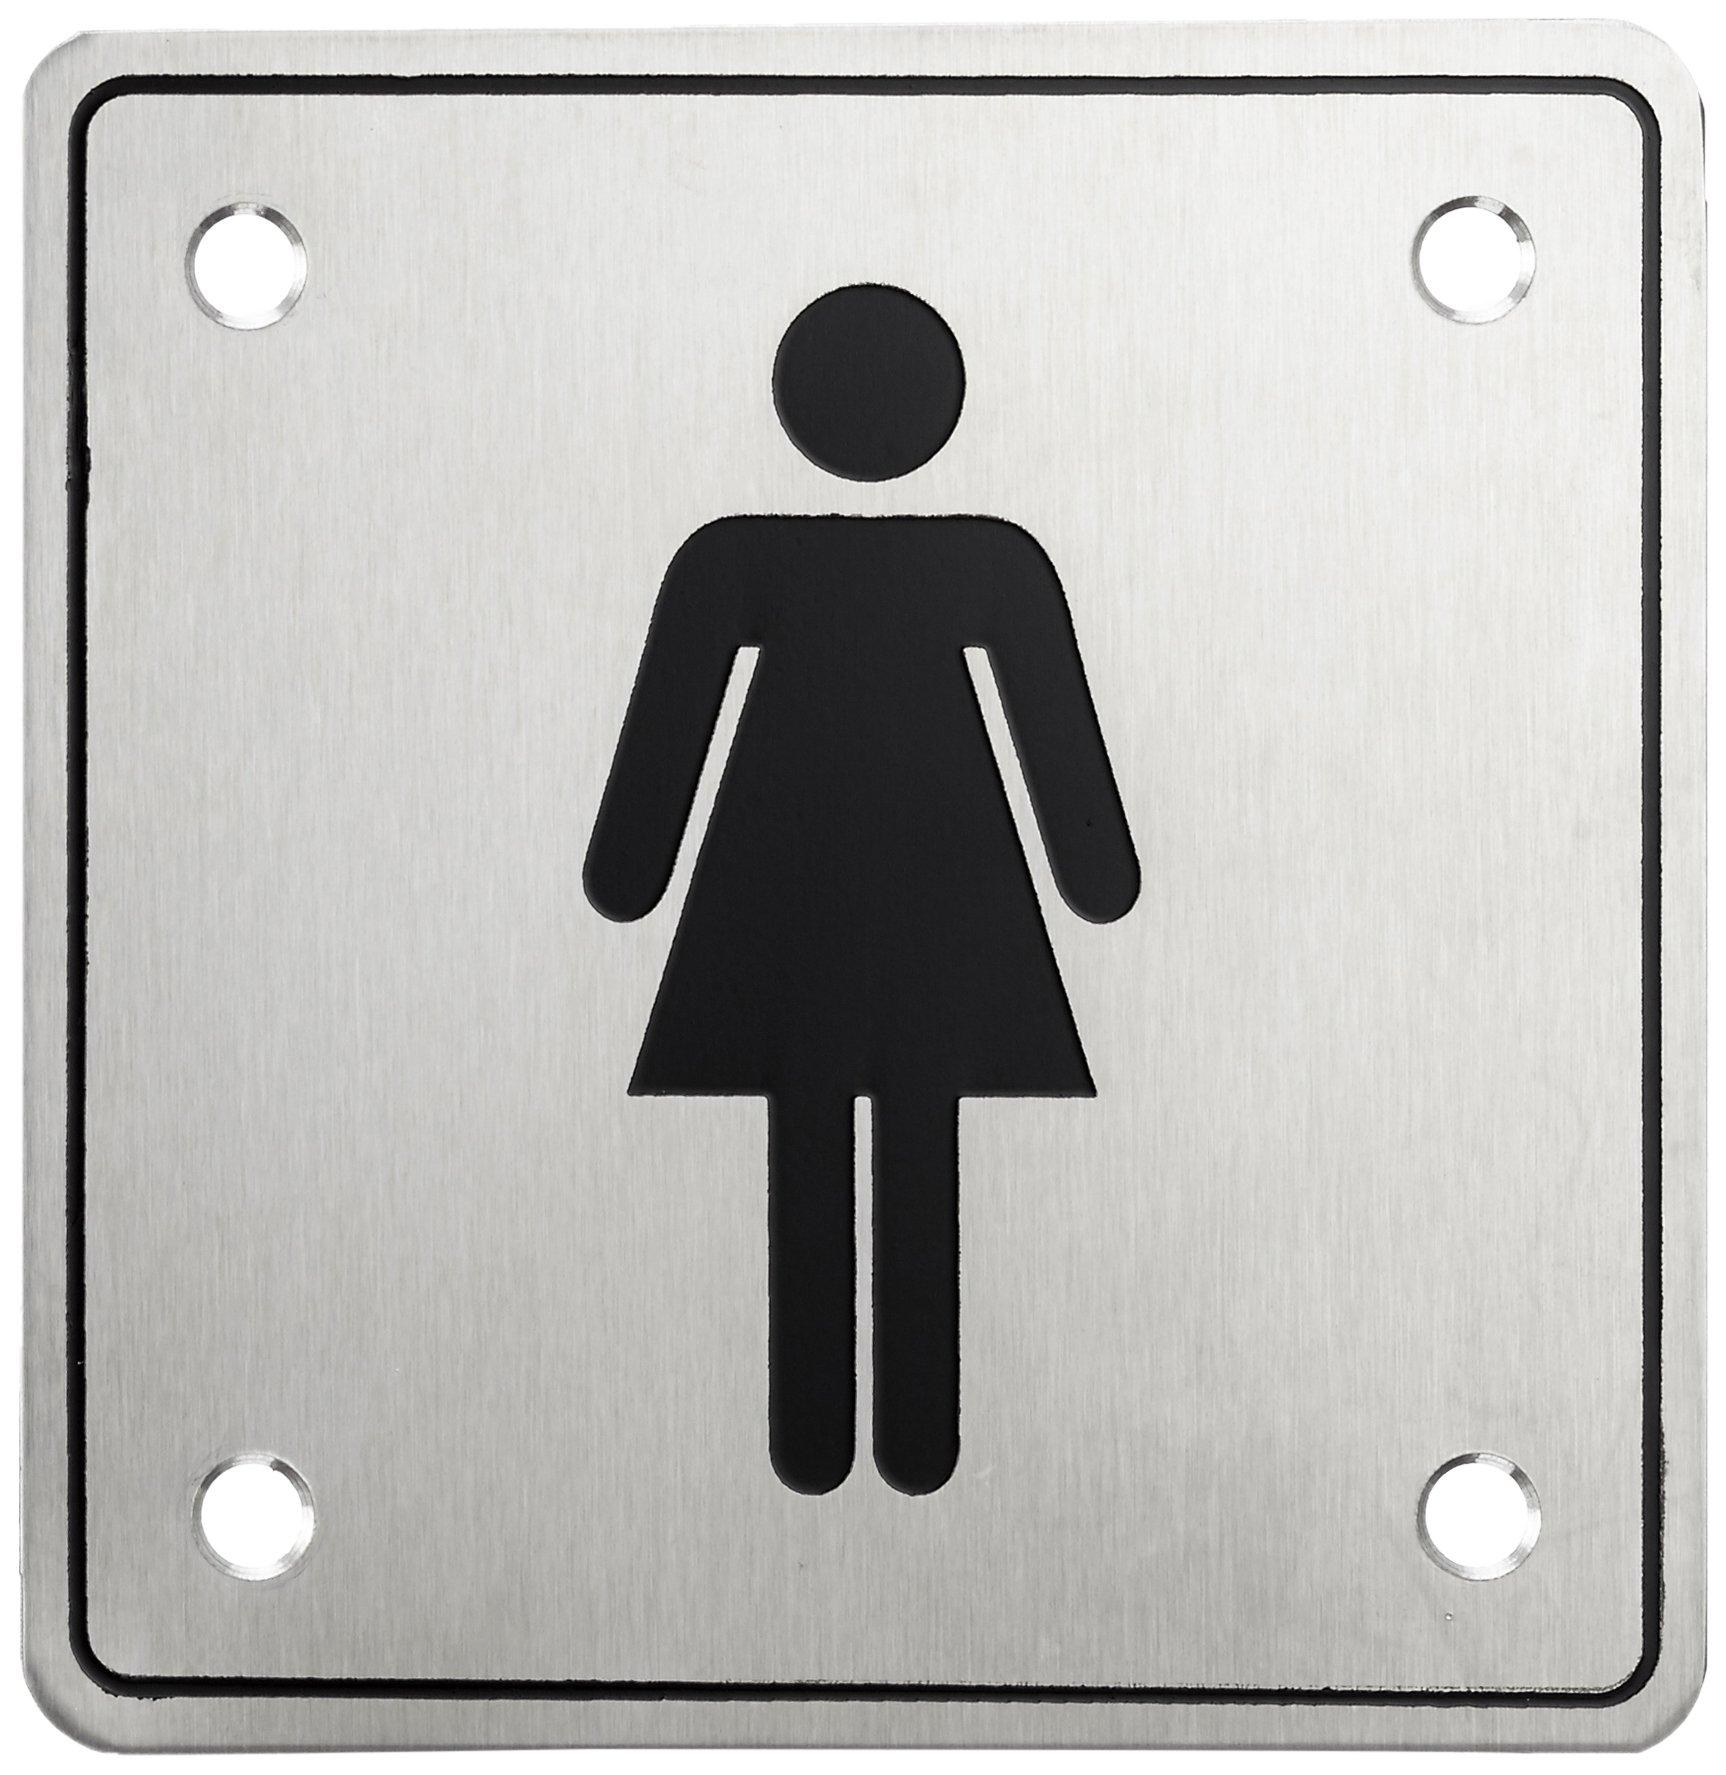 HSI 'Door Sign Women with Screw Stainless Steel 100x 100x 1(Pack of 1) 966225.0